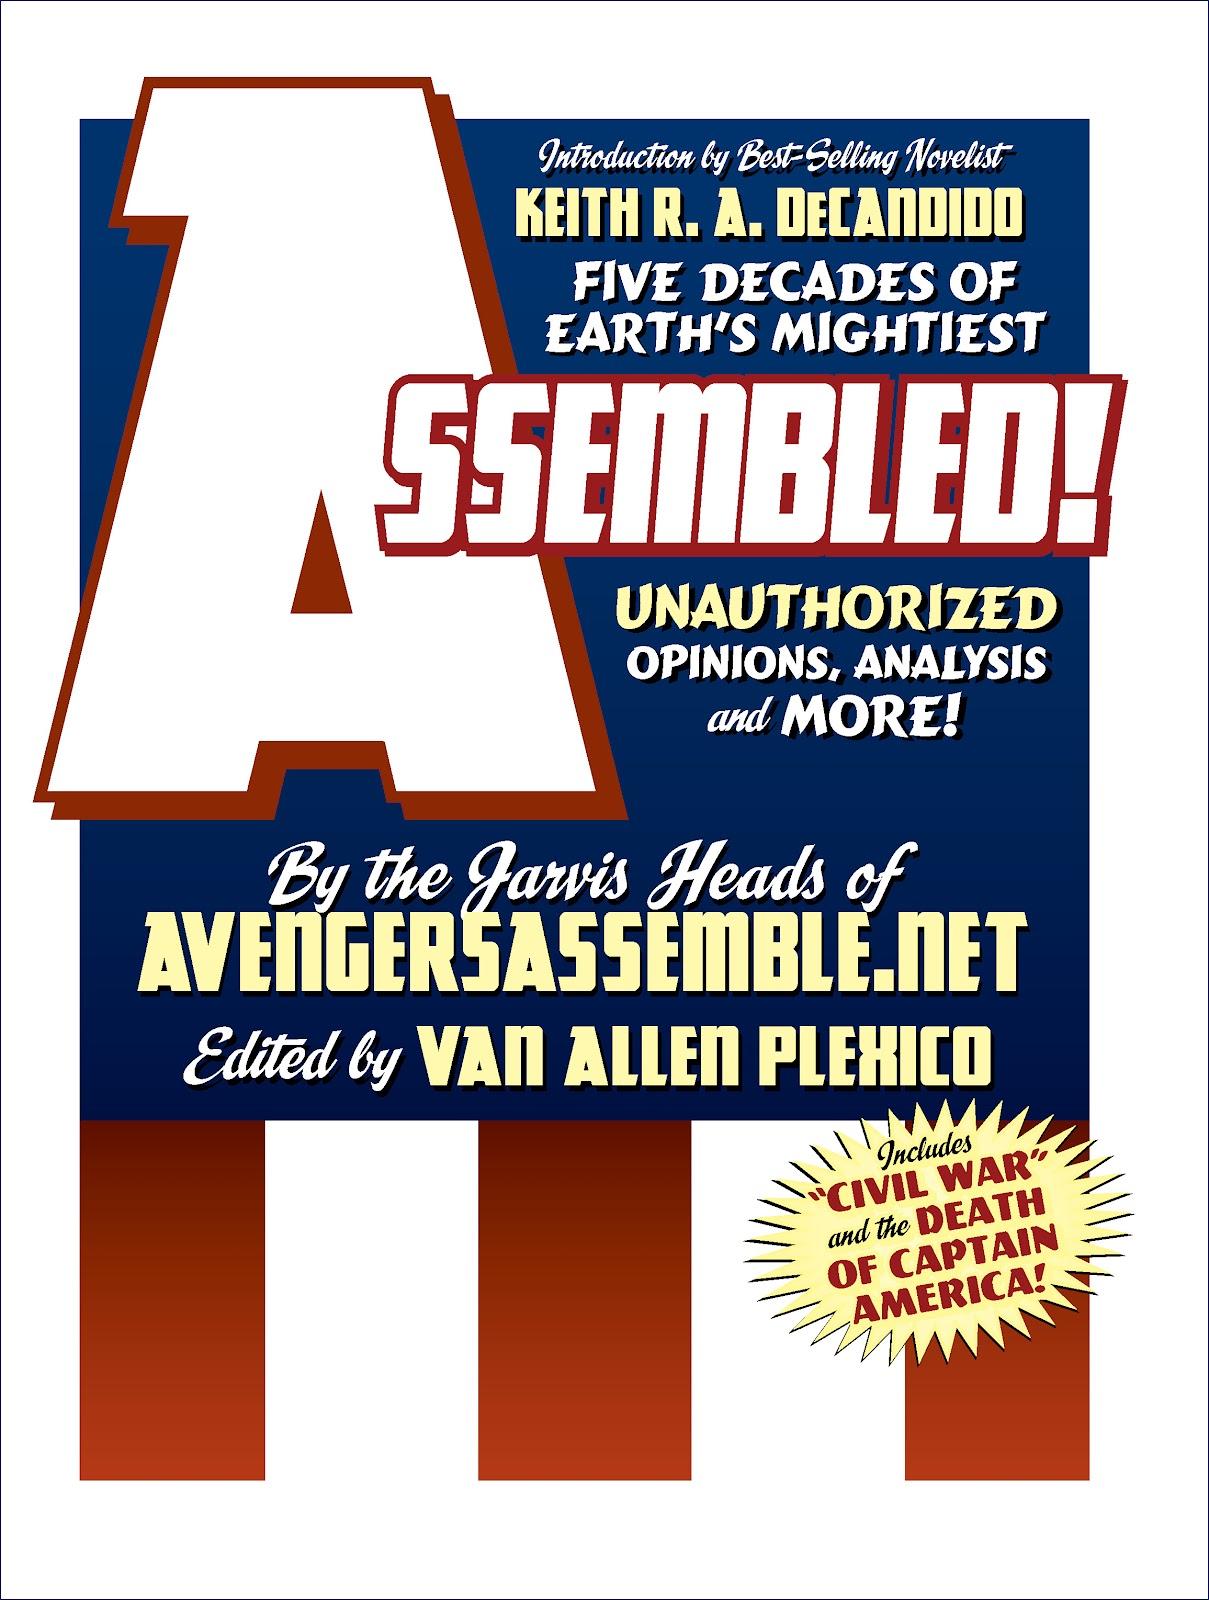 http://2.bp.blogspot.com/-anGSU_c8ETY/T8WuDHbmBdI/AAAAAAAAEXg/v_oRdNLAcUw/s1600/AssembledKindlecover.jpg